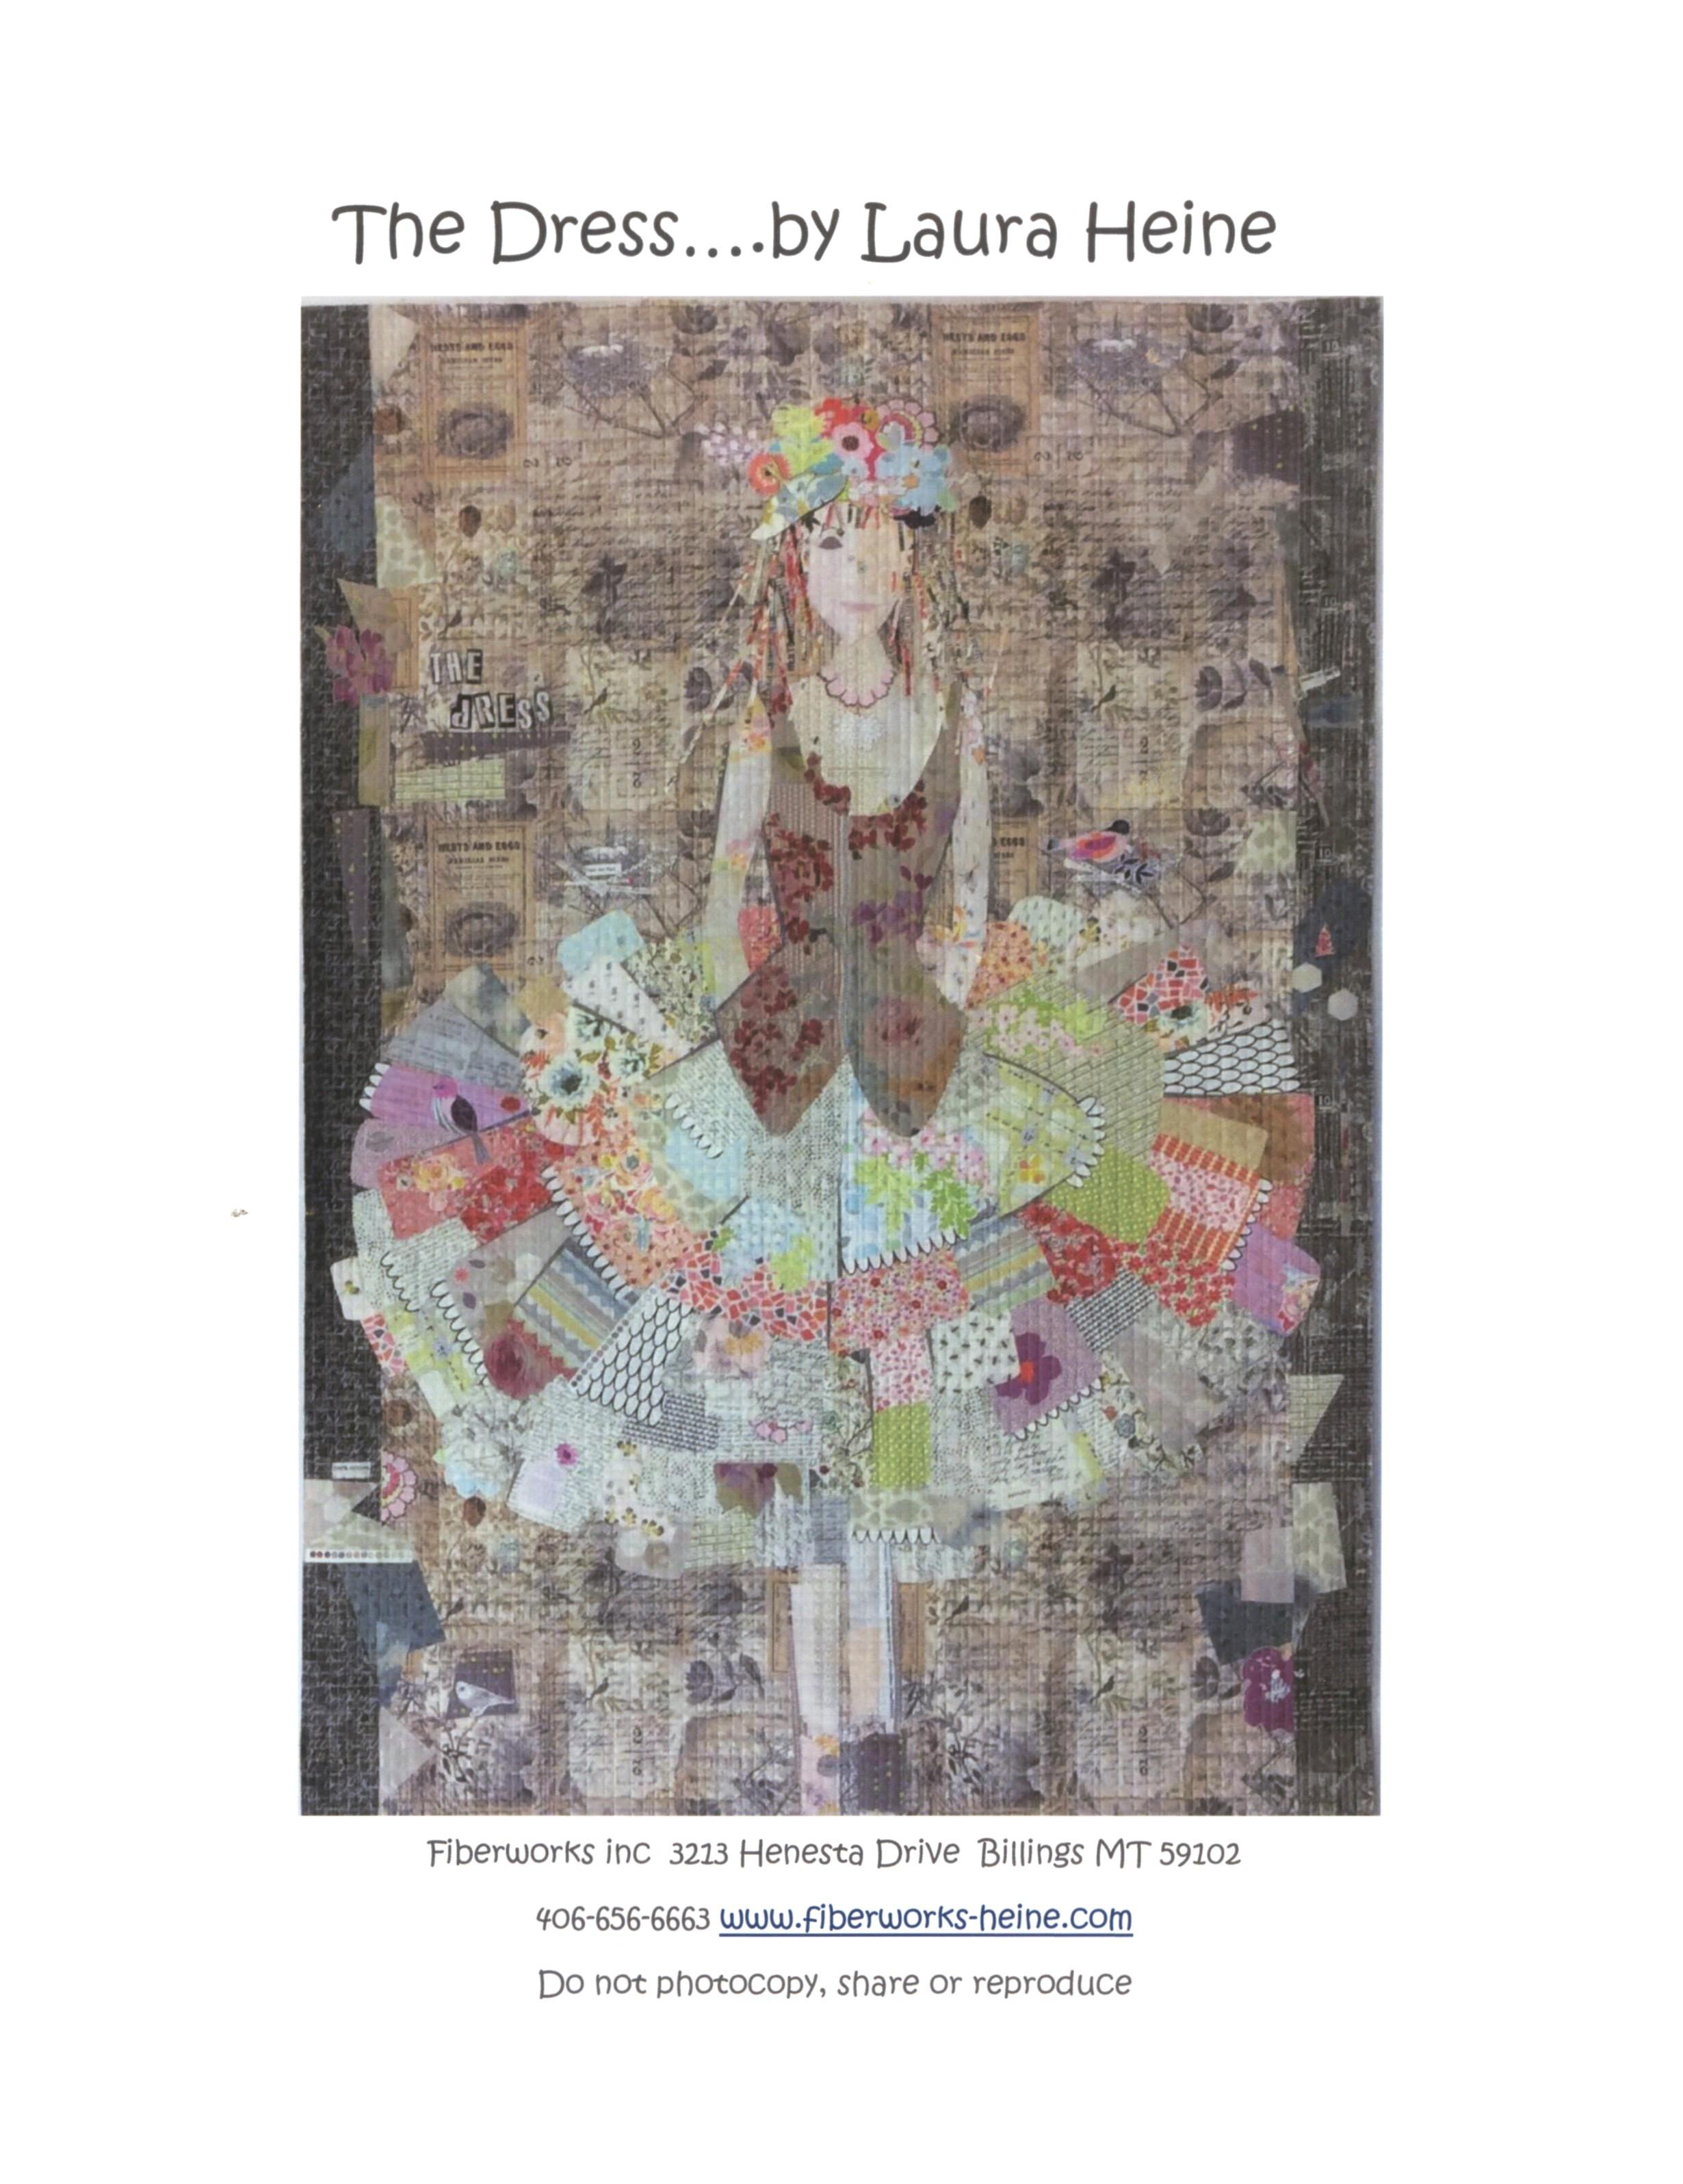 43 x 41 Oh Deer Collage Applique Quilt Pattern by Laura Heine from Fiberworks Inc LHFWOD